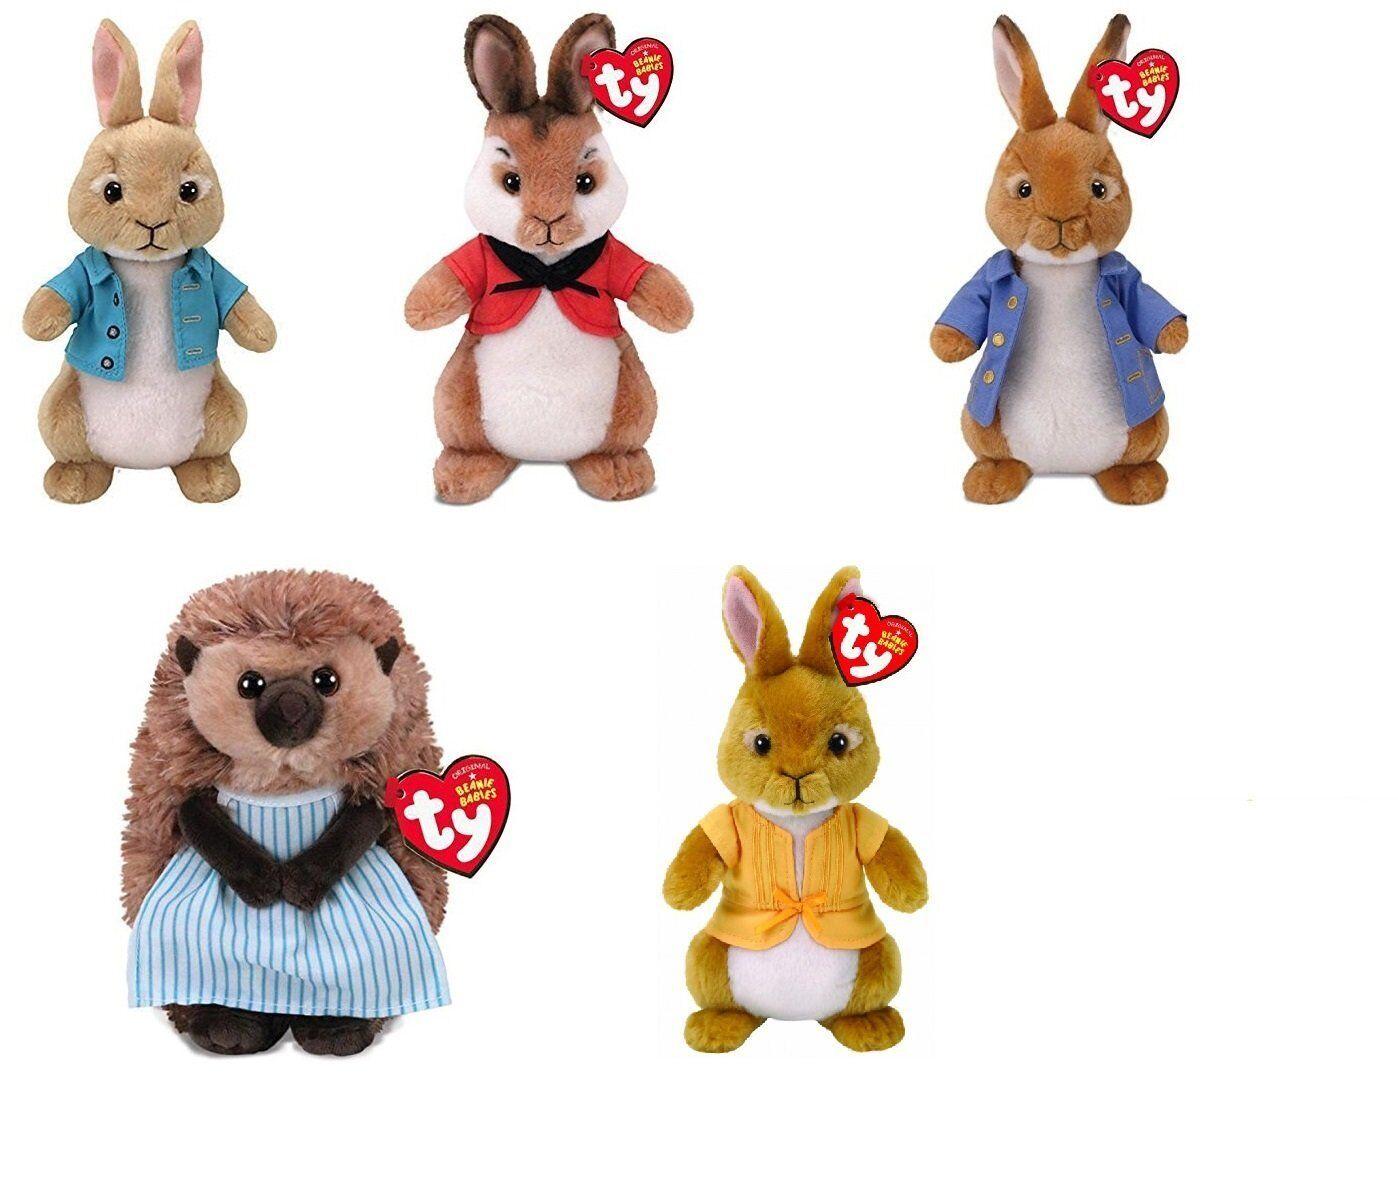 2018 Set of 5 TY 8  Cotton Tail Flospy Mopsy Peter Rabbit Mrs Tiggy Winkle Plush